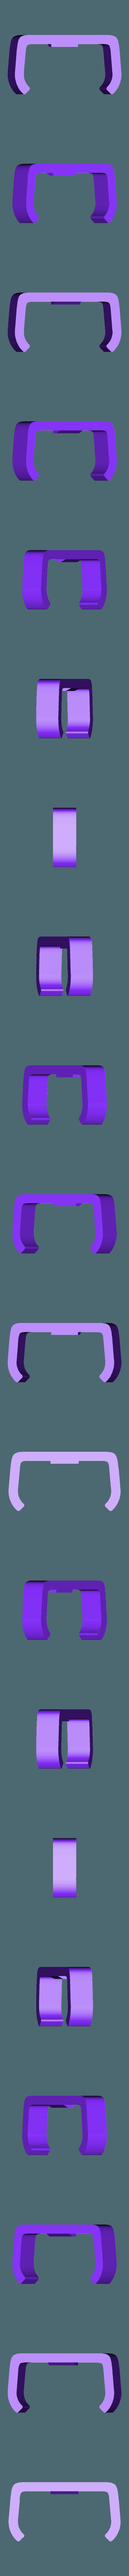 Tiko_Upper_Motor_Mount_Clip_-_00.stl Download free STL file Tiko Motor Mount Tensioner Clips • 3D printable template, WalterHsiao